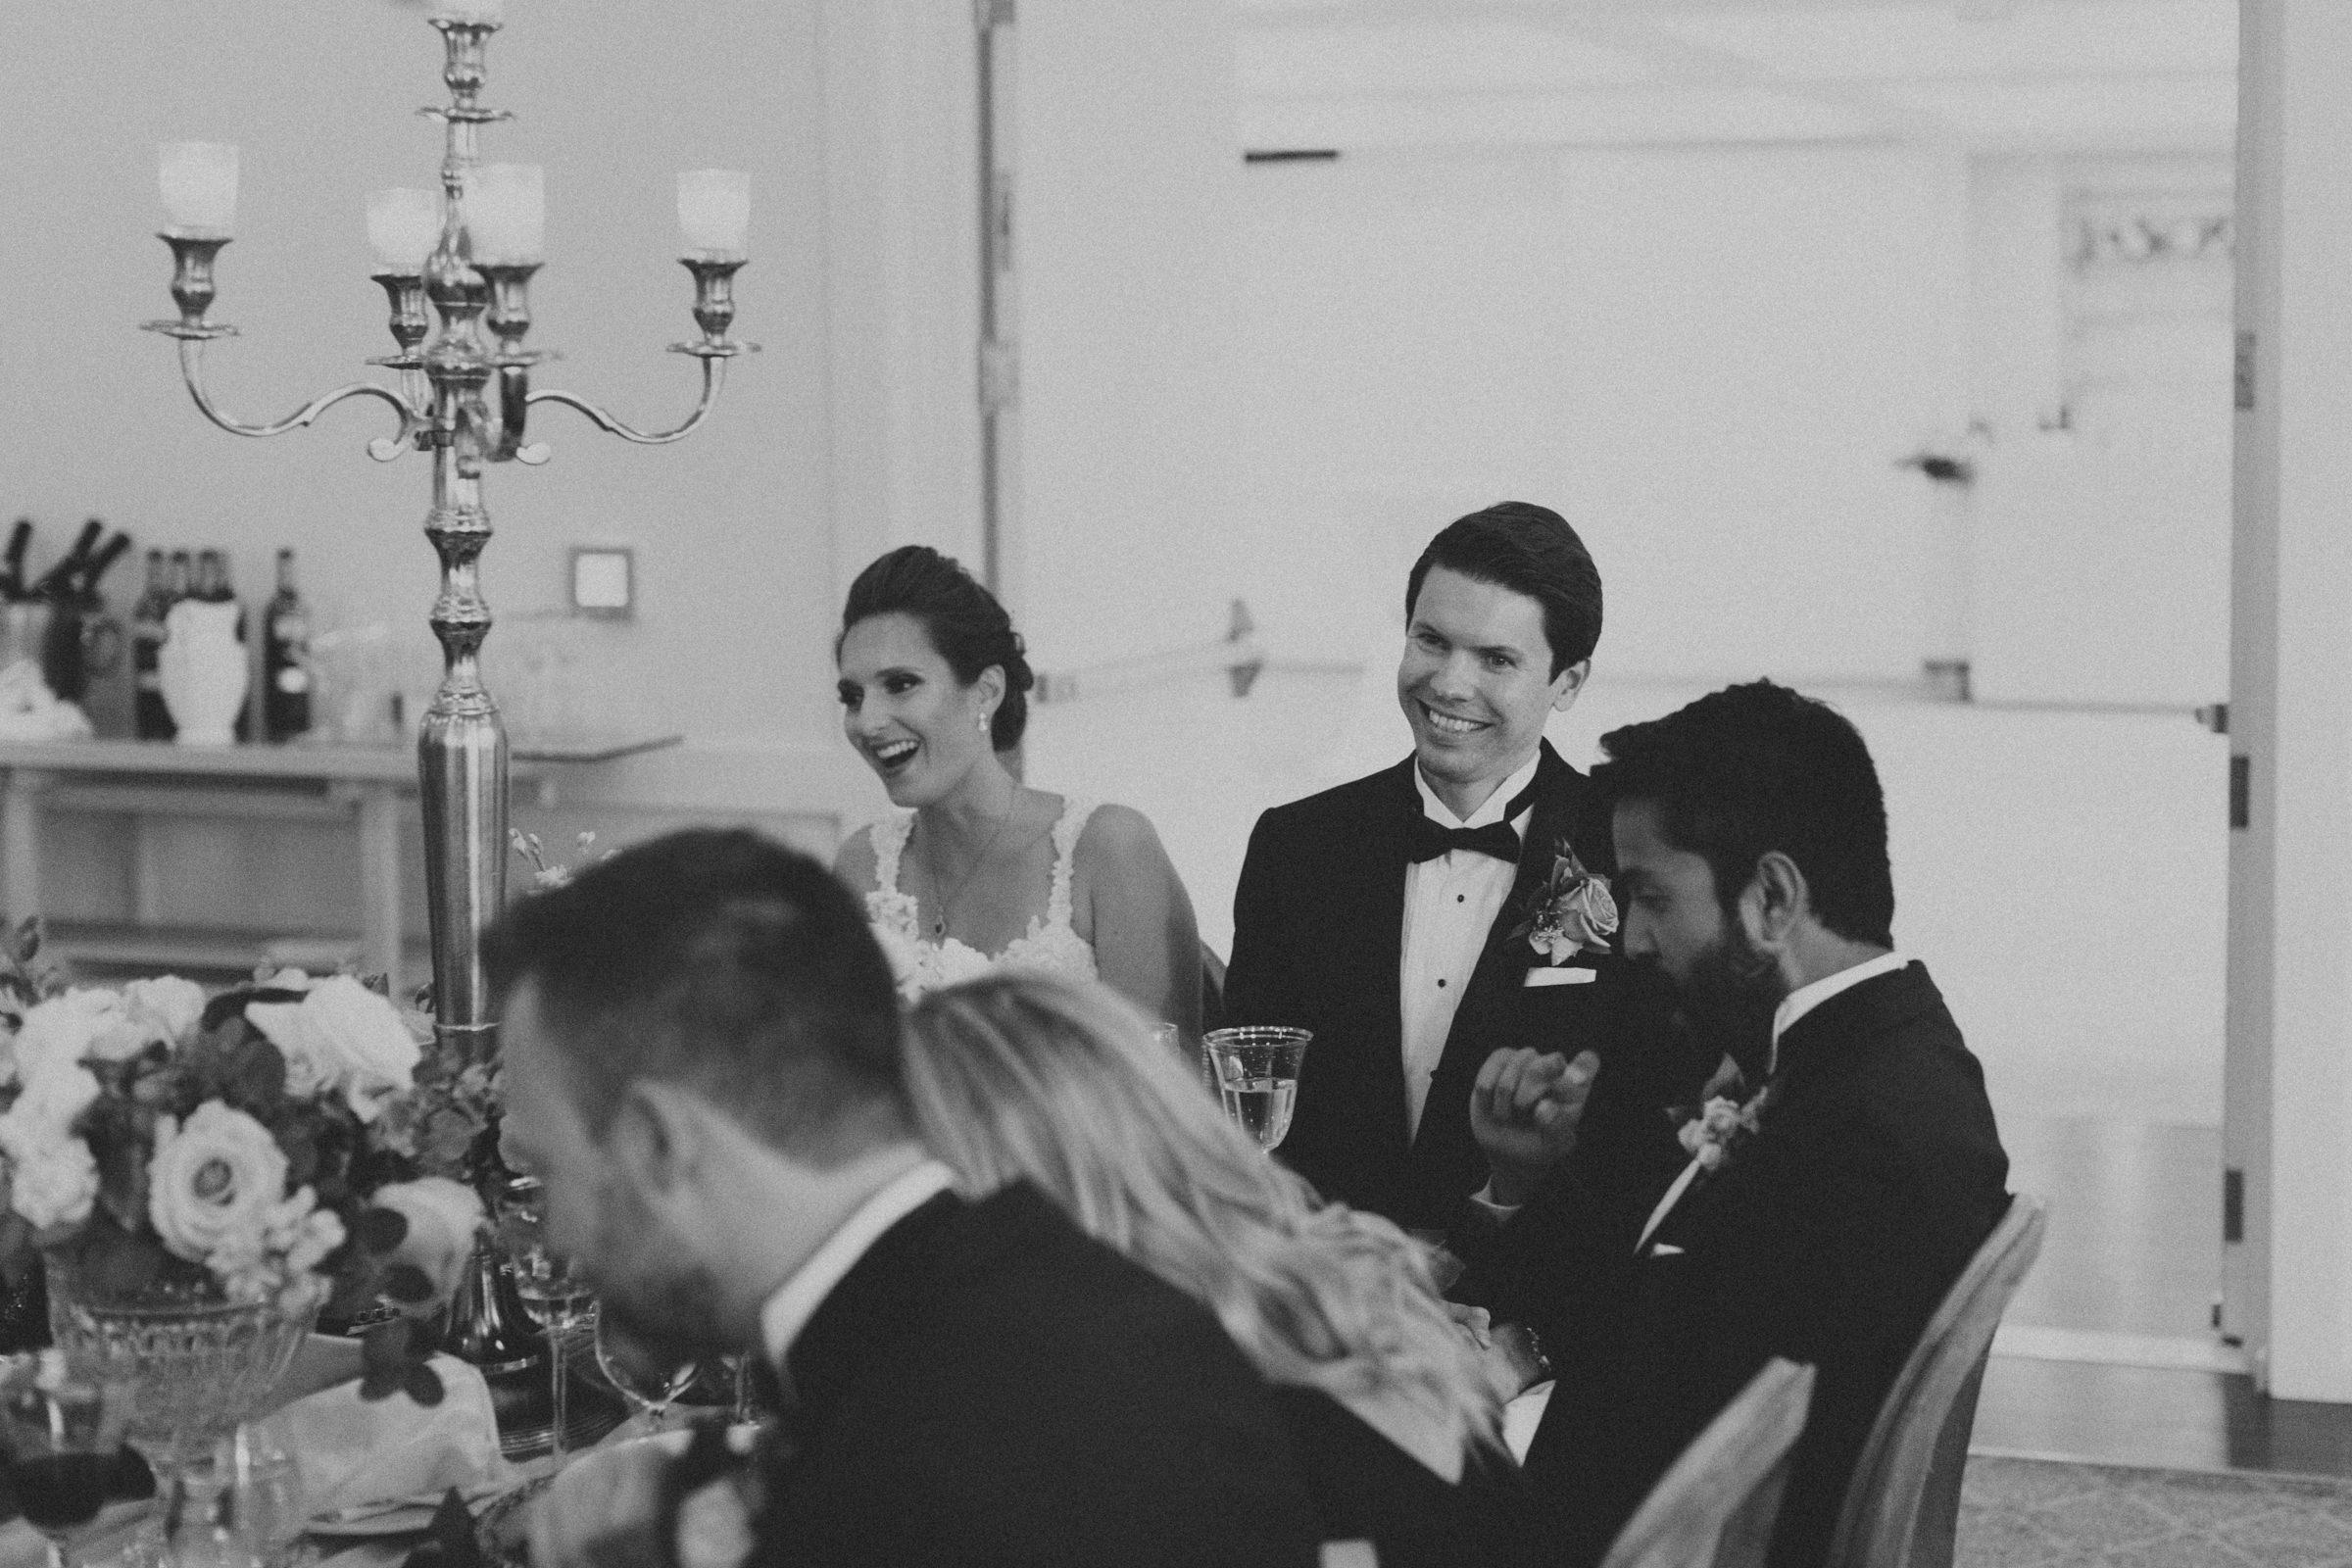 Langdon-Hall-wedding-photography-Cambridge-by-Sam-Wong-of-Visual-Cravings_Sarah-Ryan_54.jpg